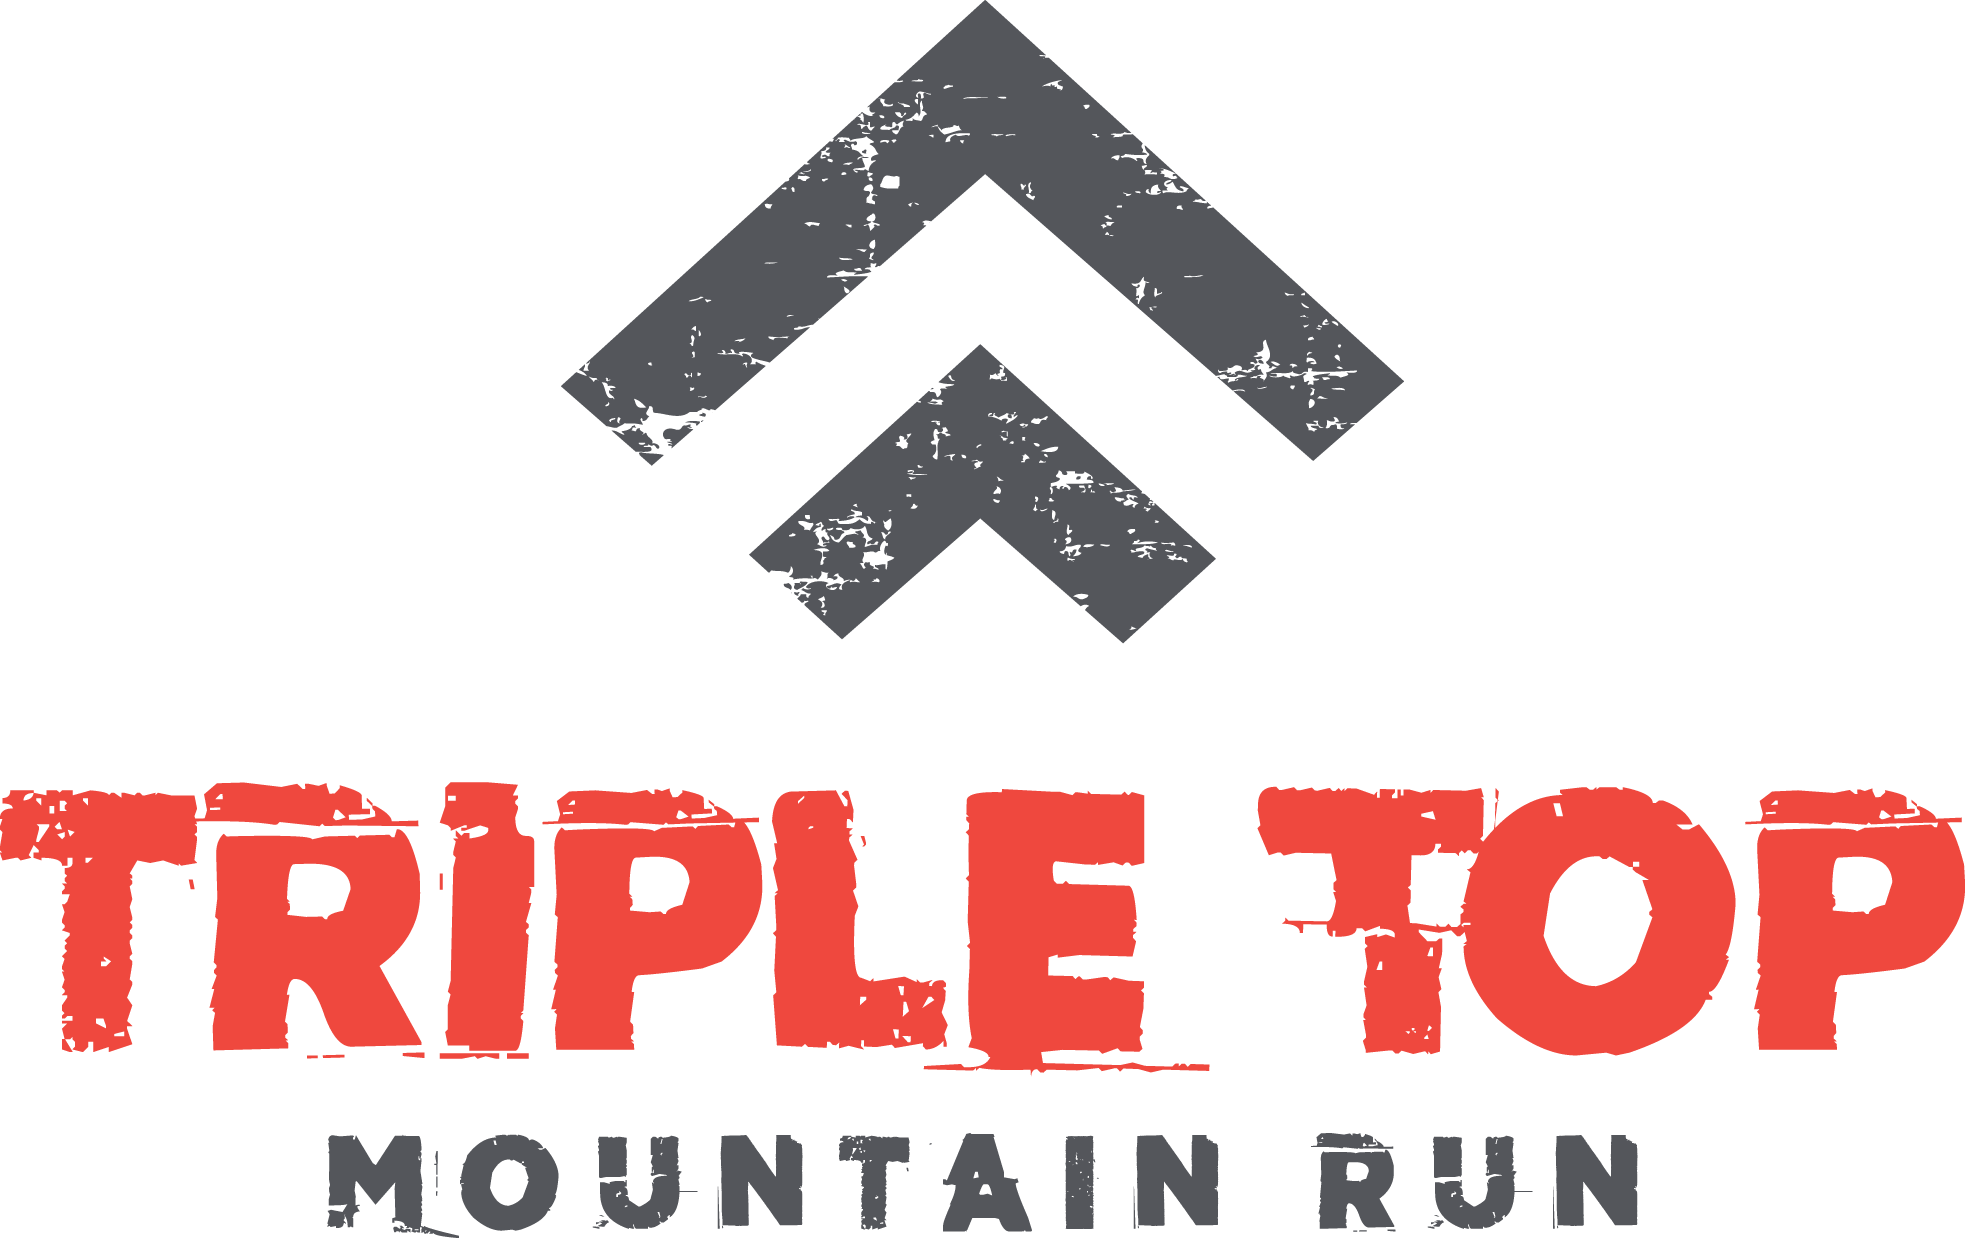 Triple_Top_logo_grey+red.png